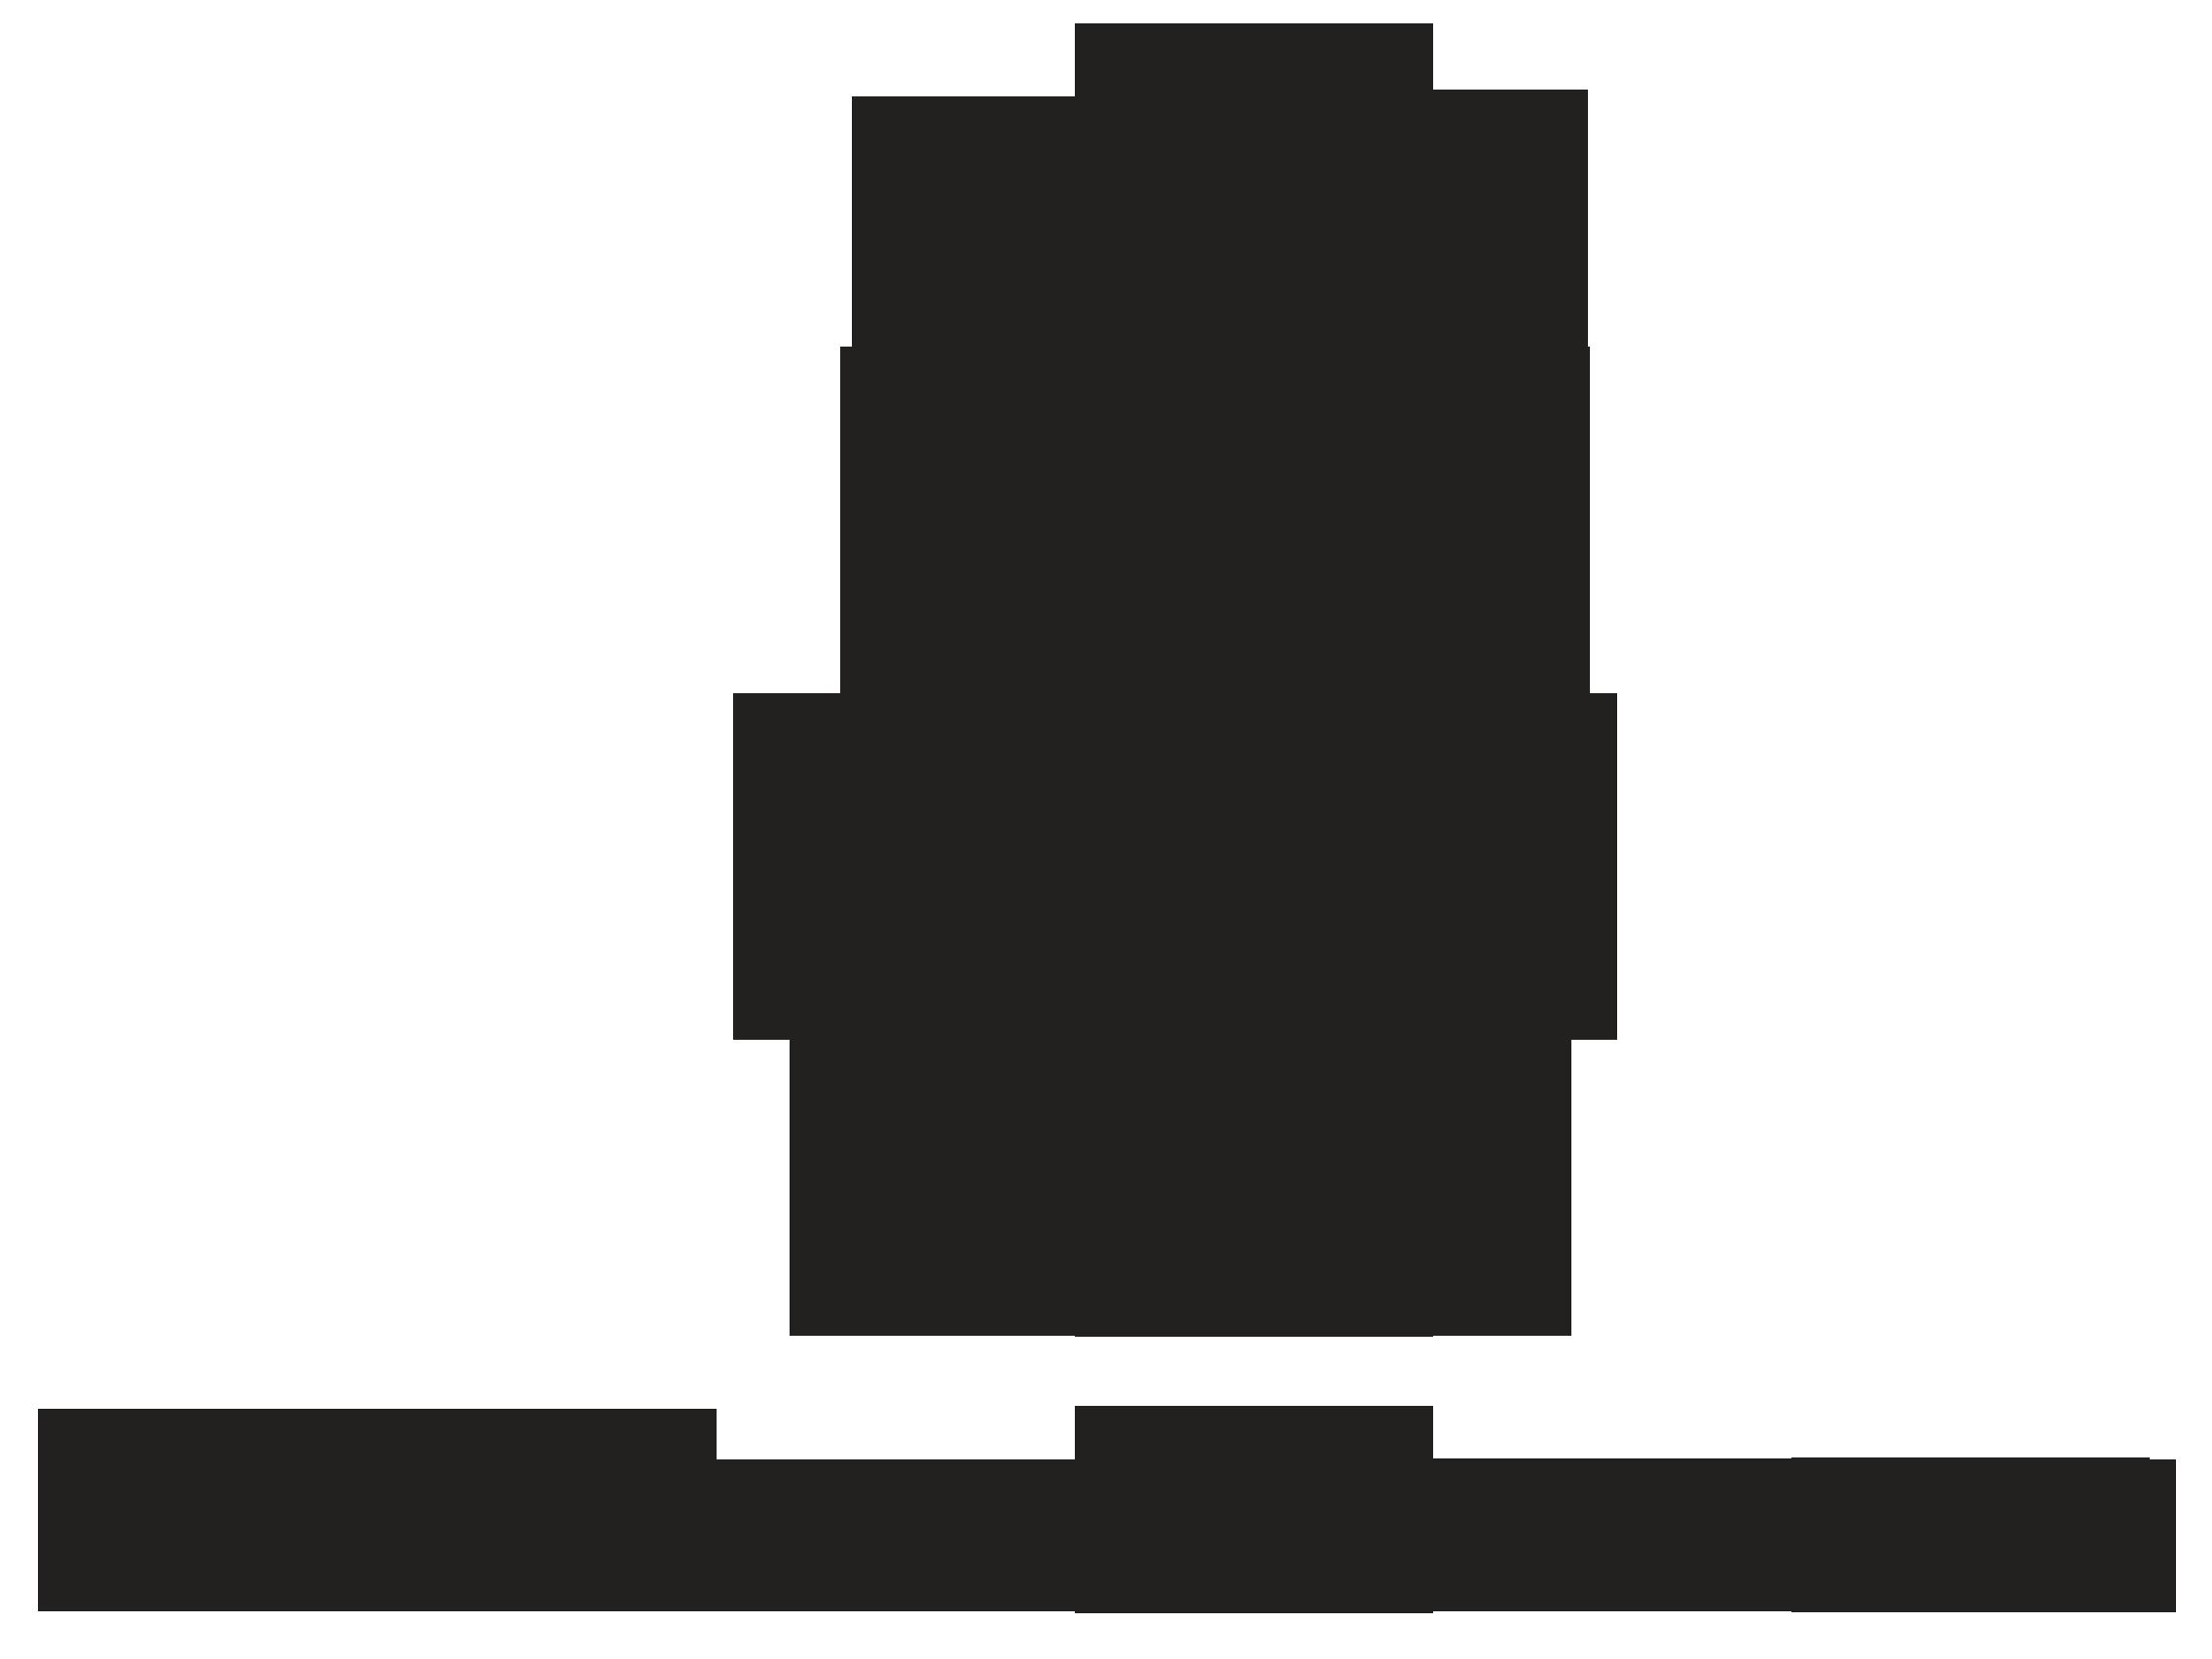 ritz carlton logo.png